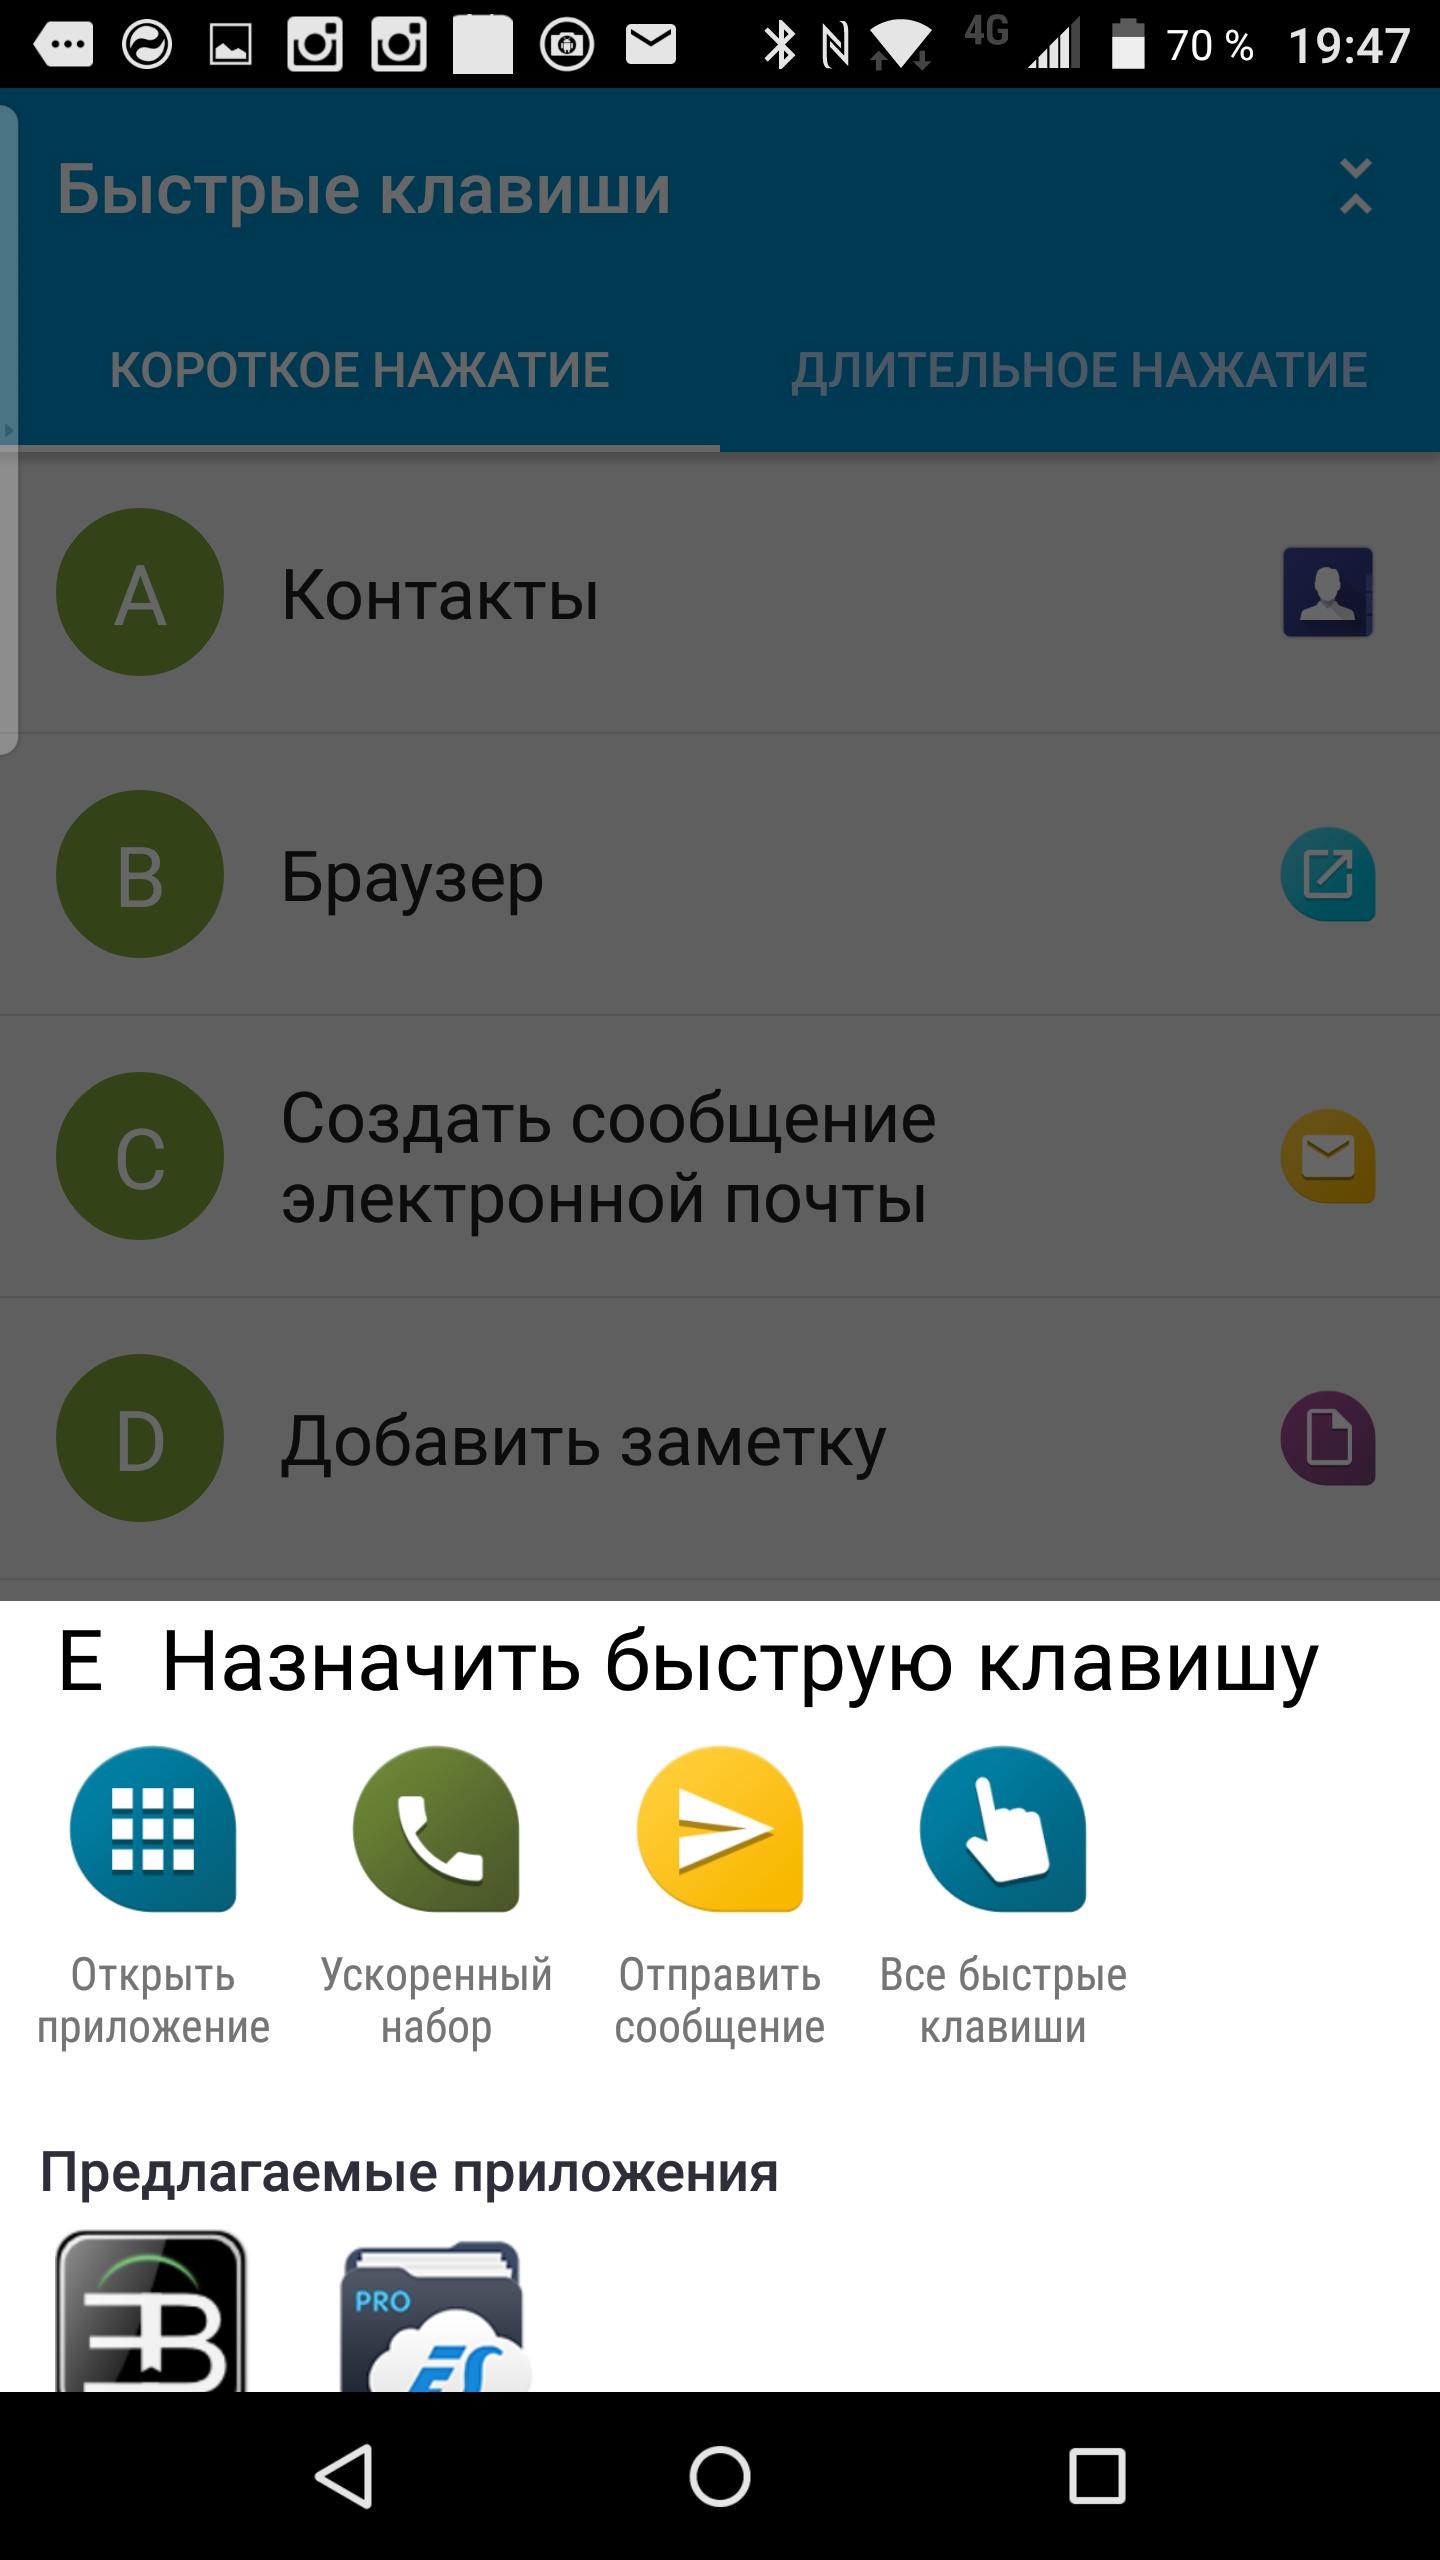 Screenshot_2016-01-21-19-47-47